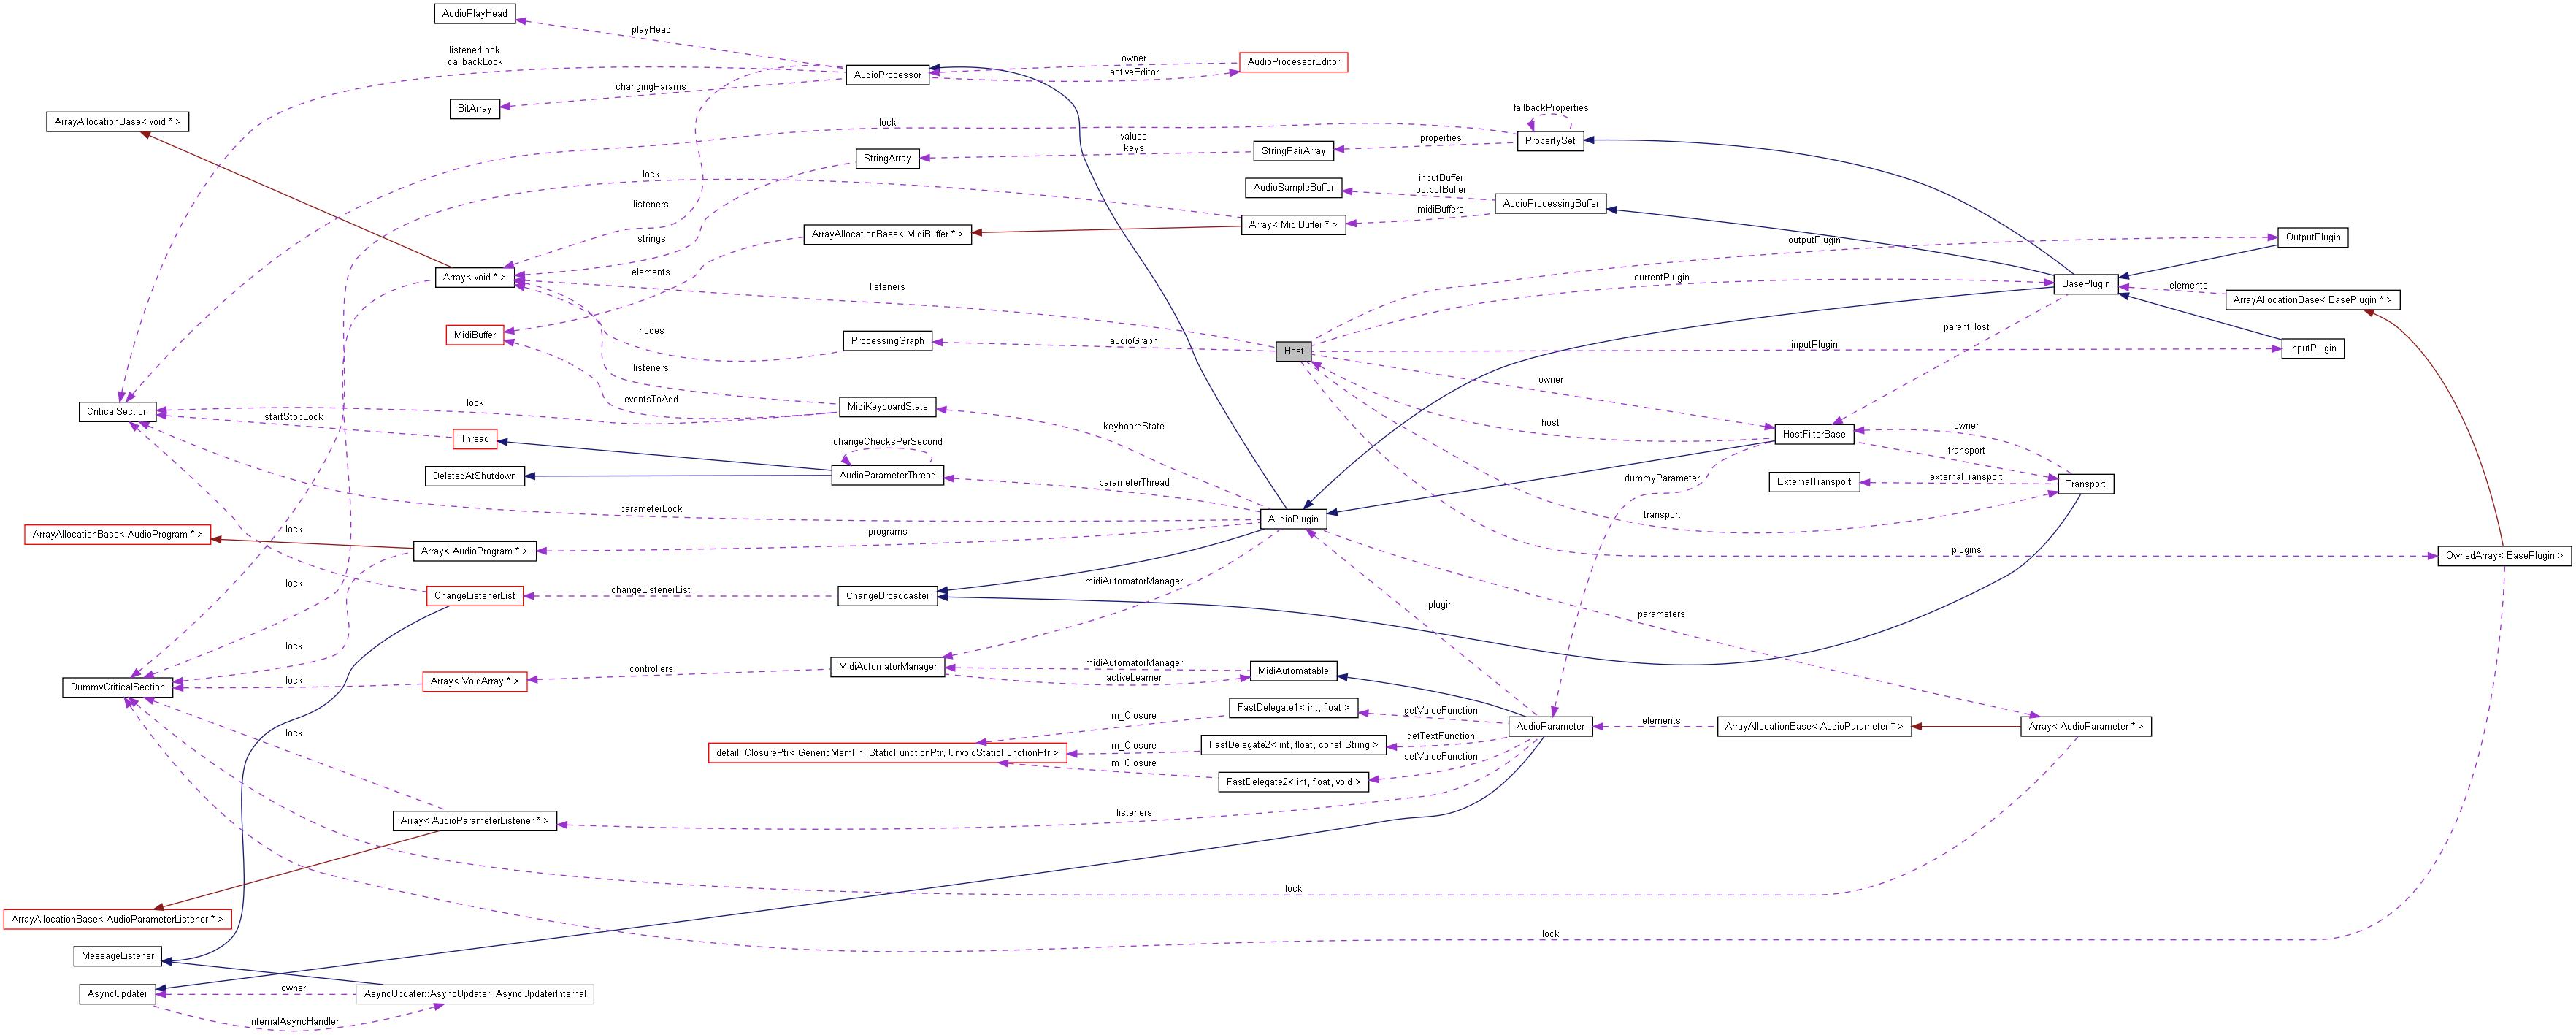 class_host__coll__graph.png